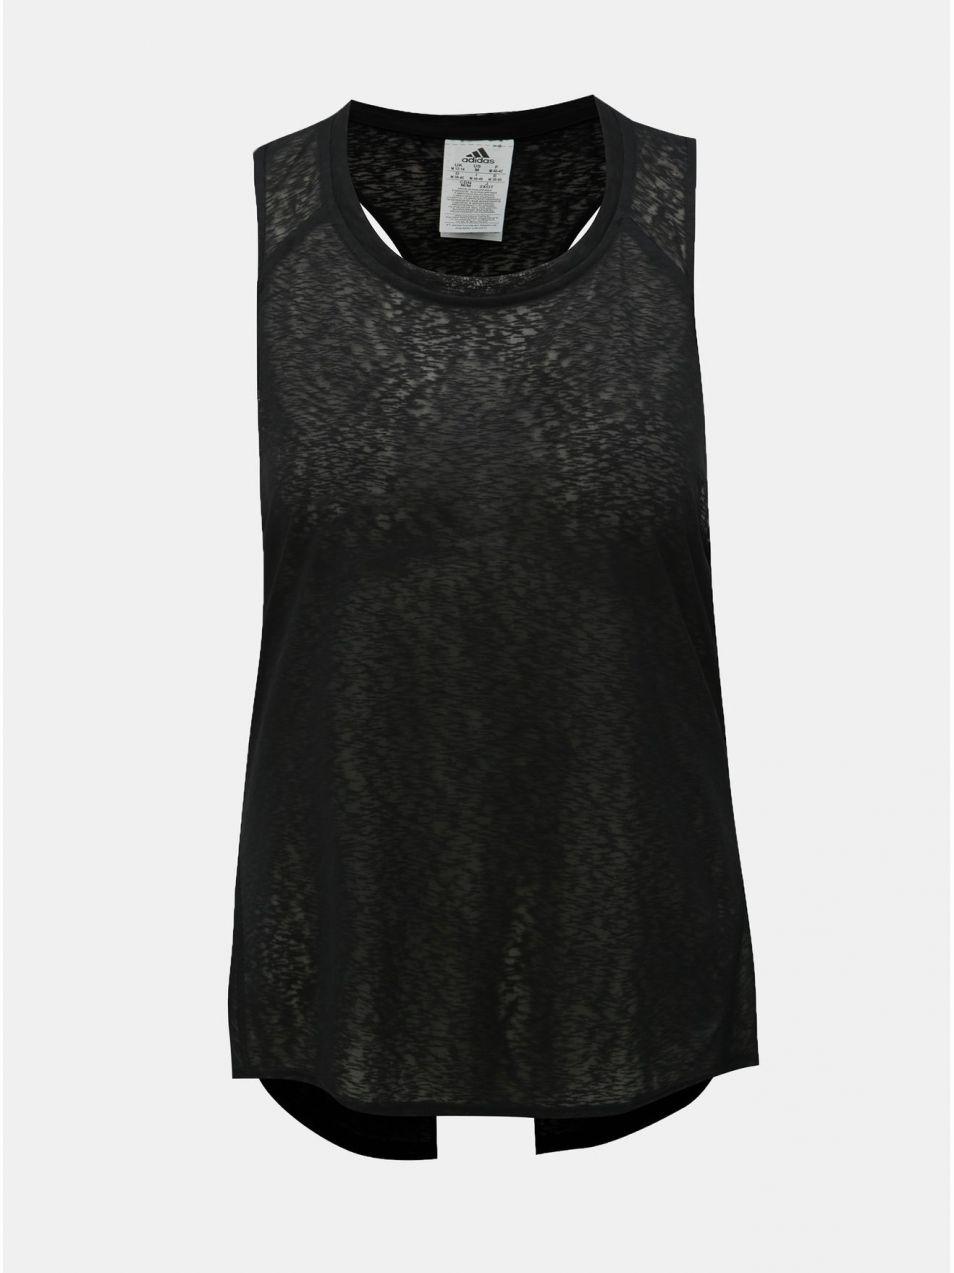 82efbff52ba8a Čierne dámske tielko adidas Performance CTMPRY značky adidas ...